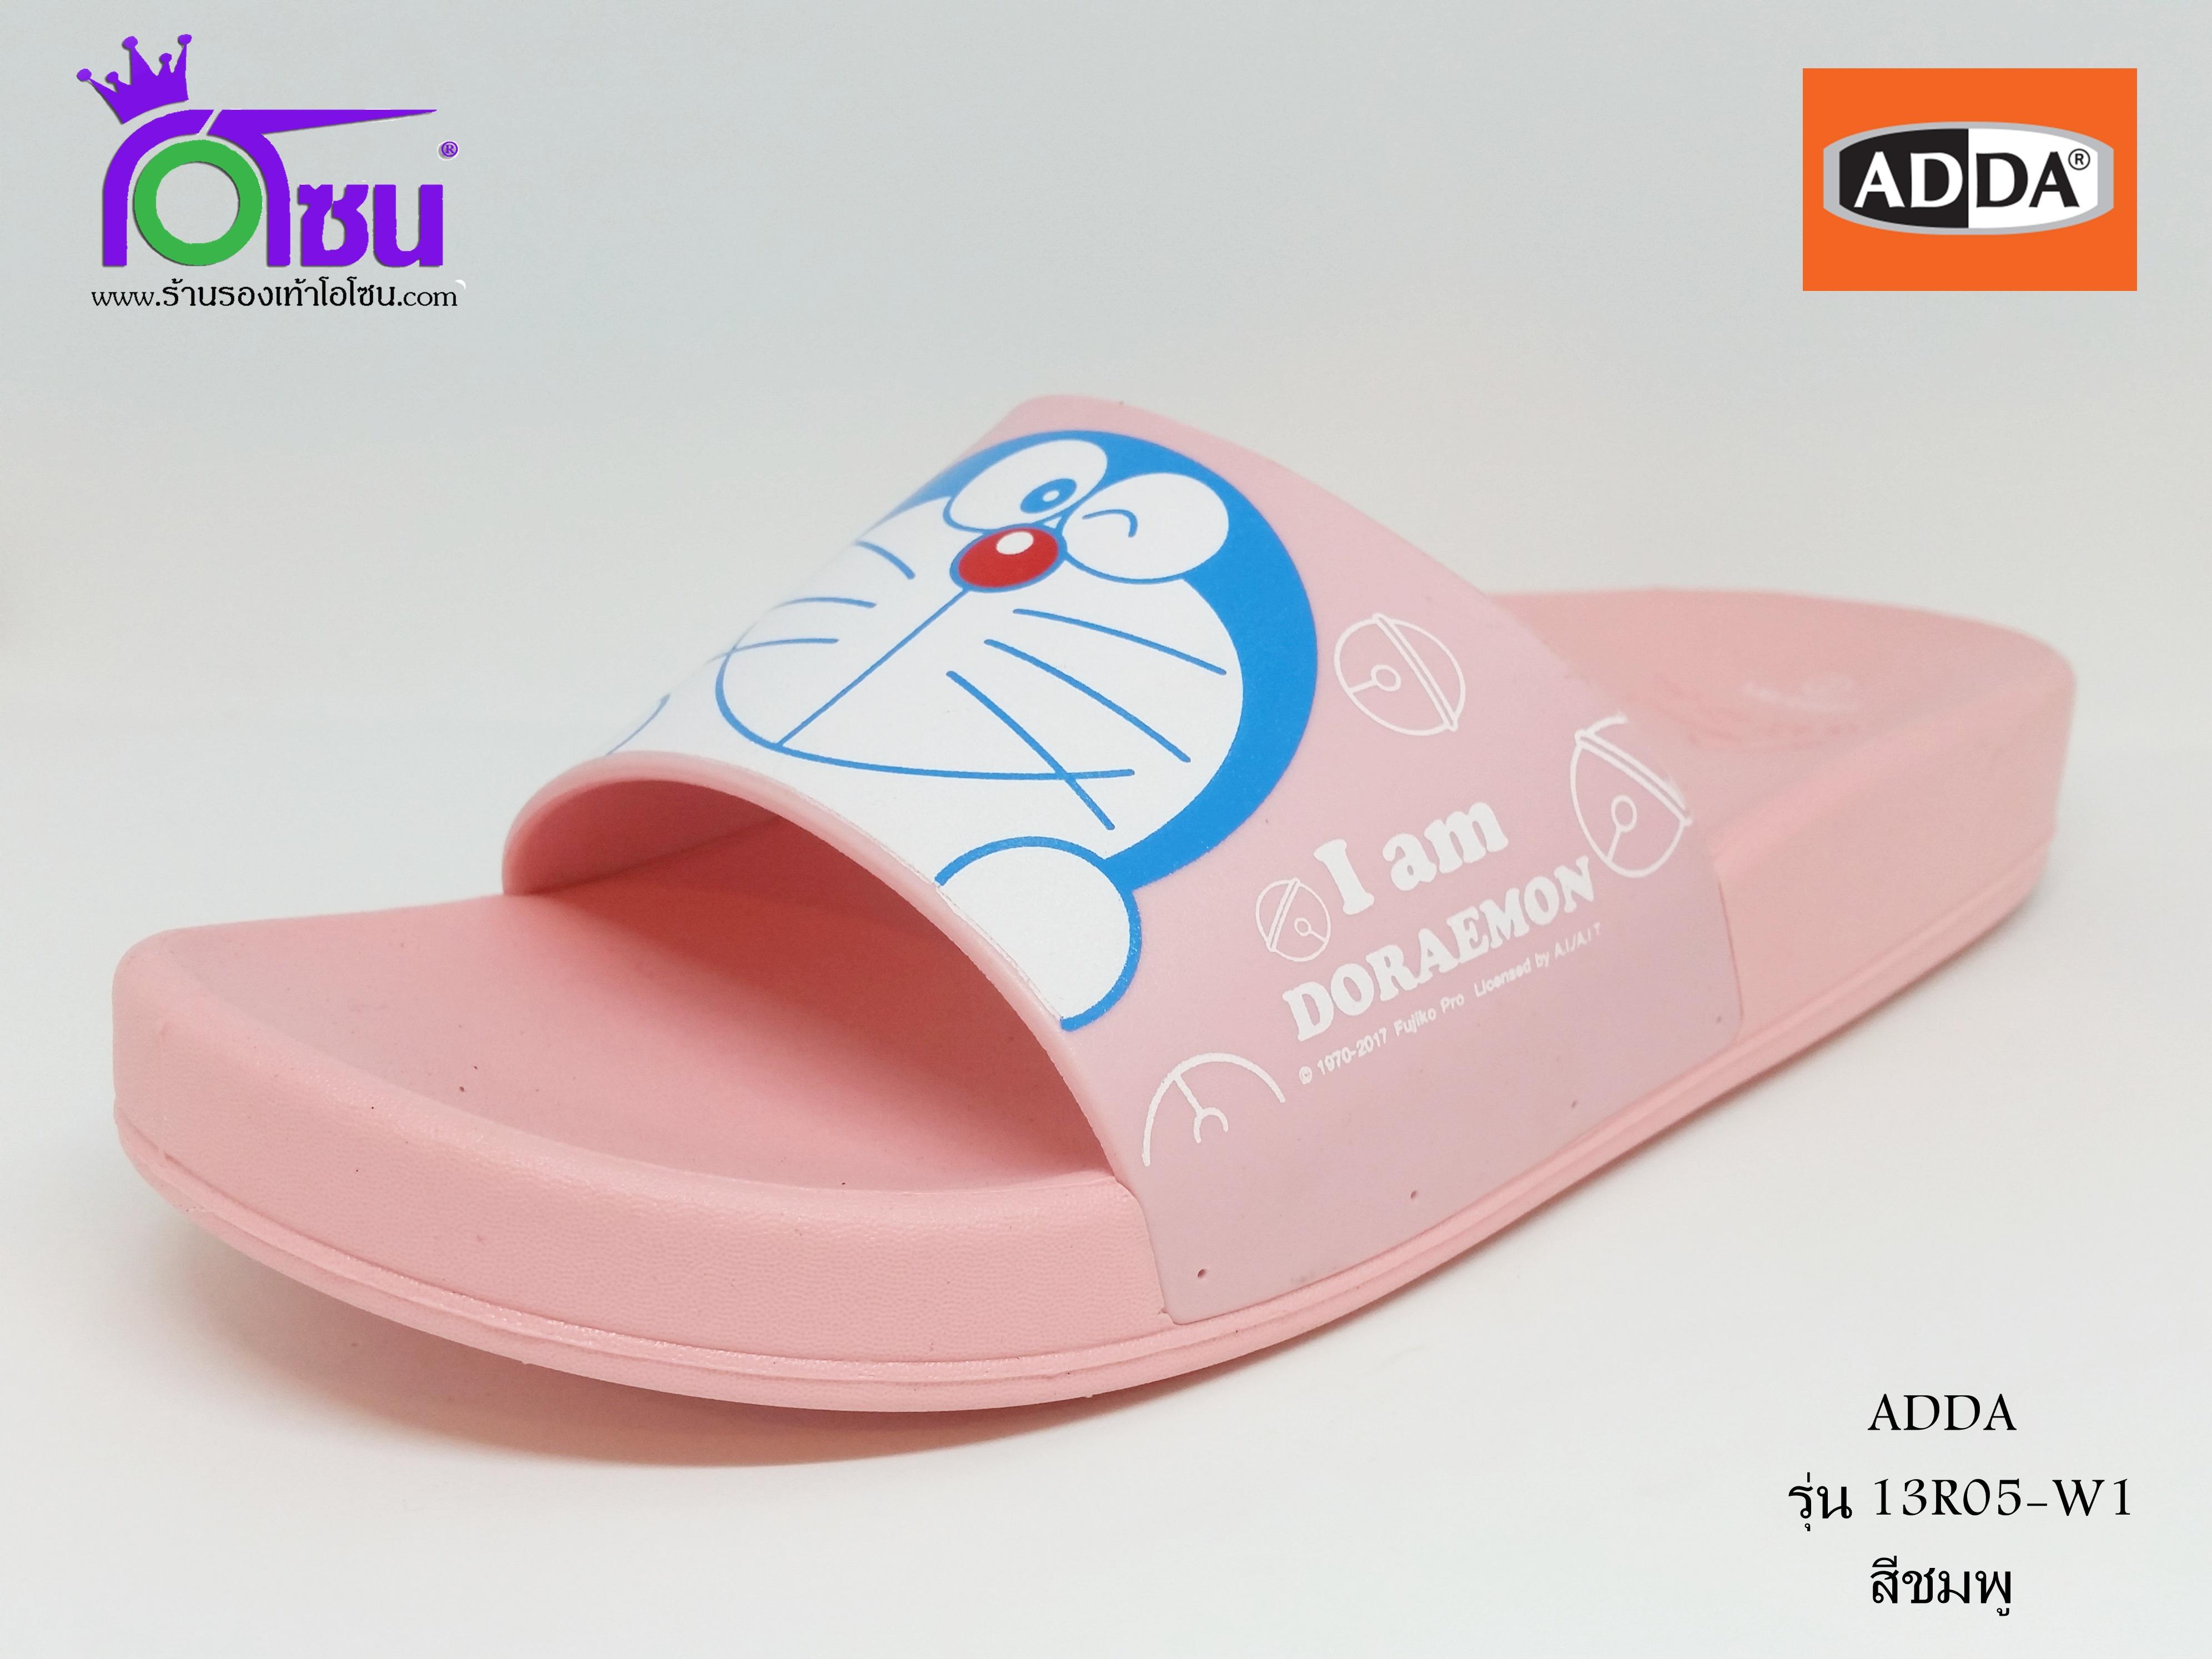 ADDA Doraemon แอ๊ดด้า โดราเอมอน รหัส 13R05-W1 สีชมพูอ่อน เบอร์ 4-7